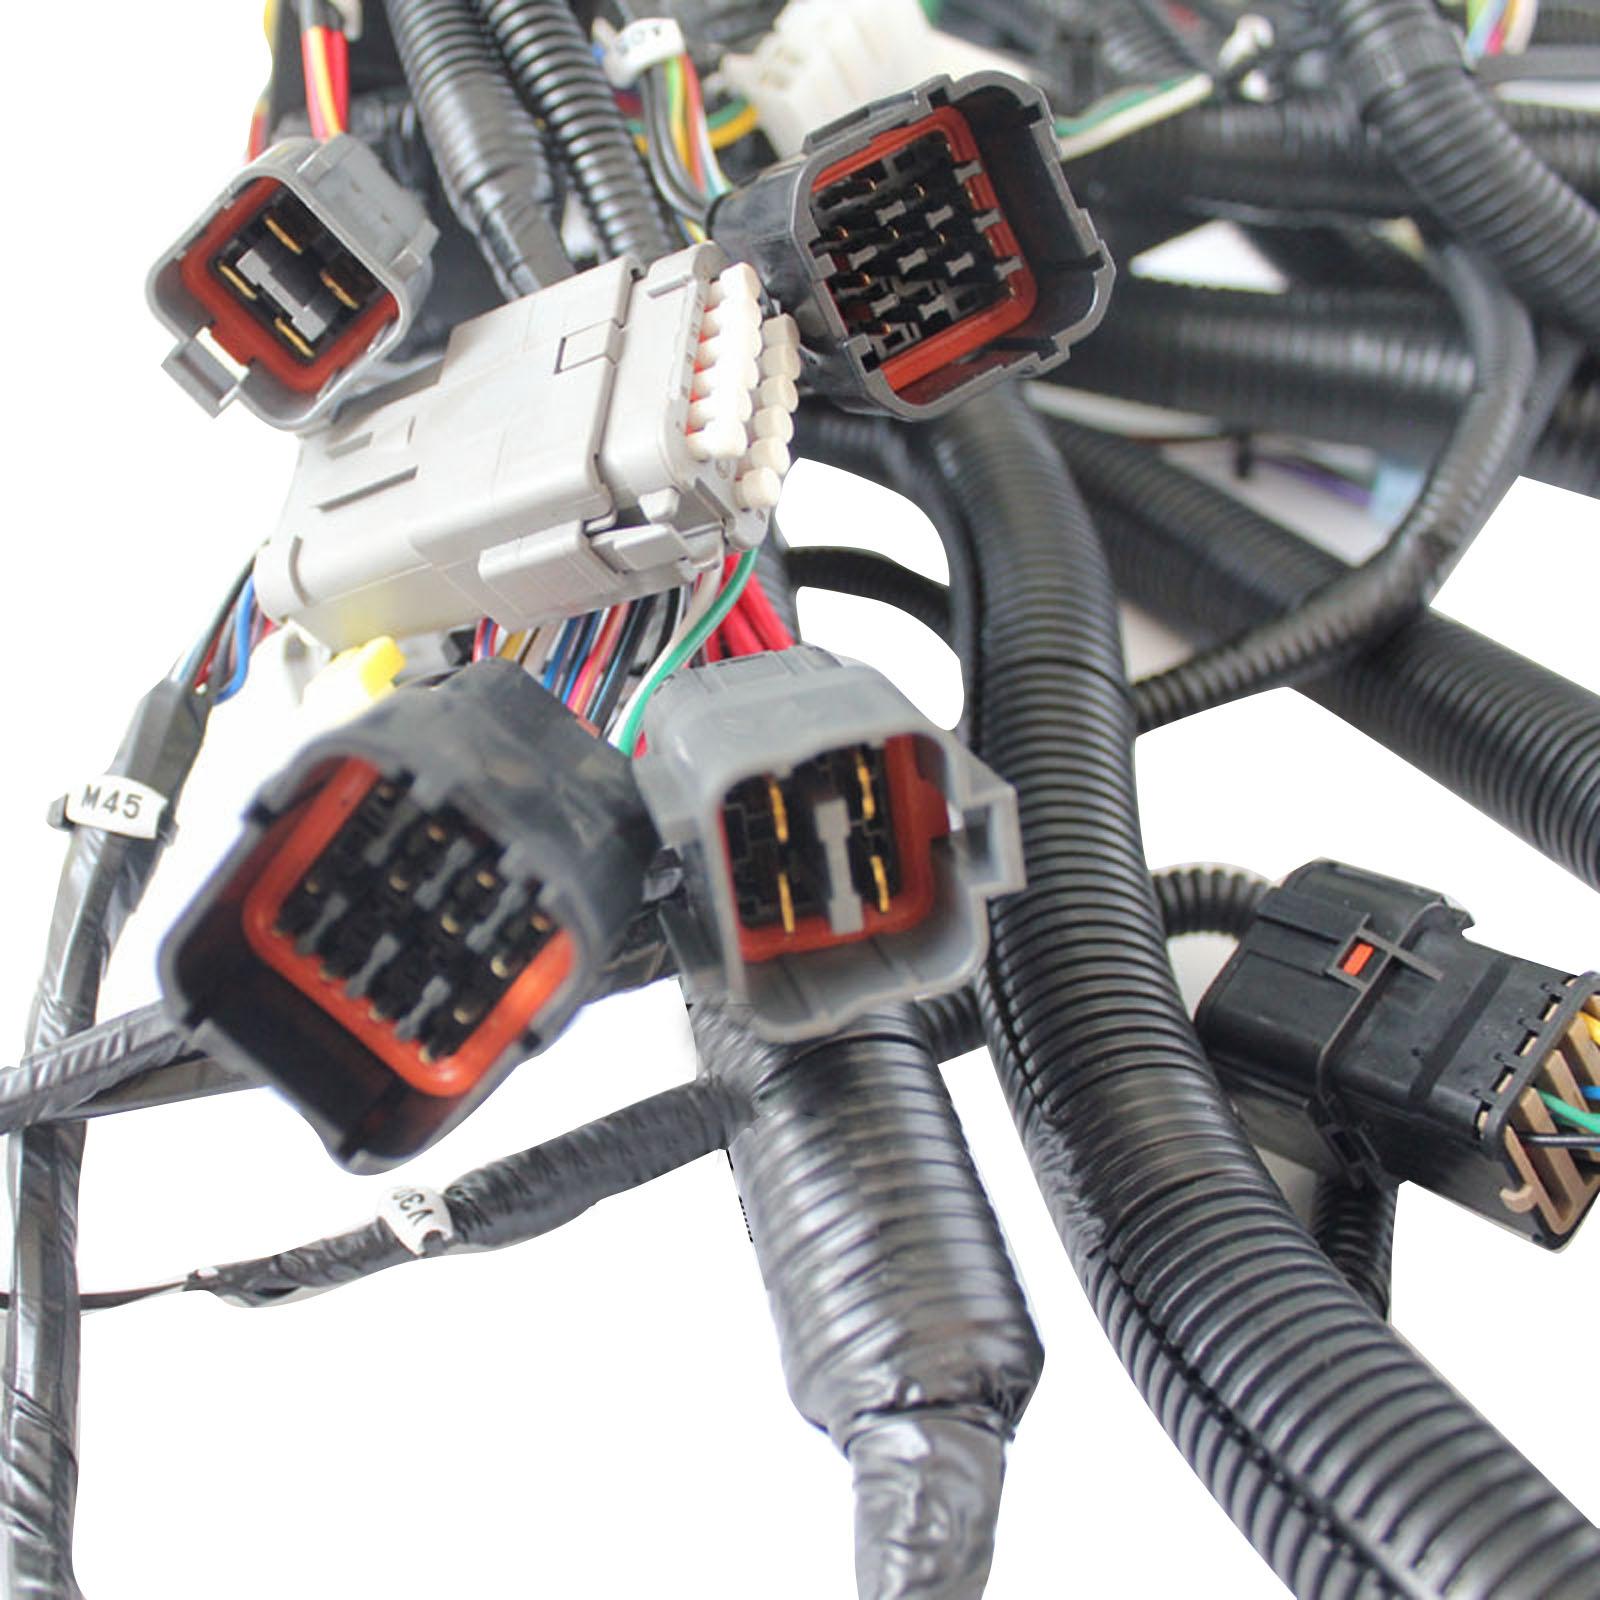 208-06-71510 internal cabin wiring harness for komatsu excavator pc400-7  pc450-7